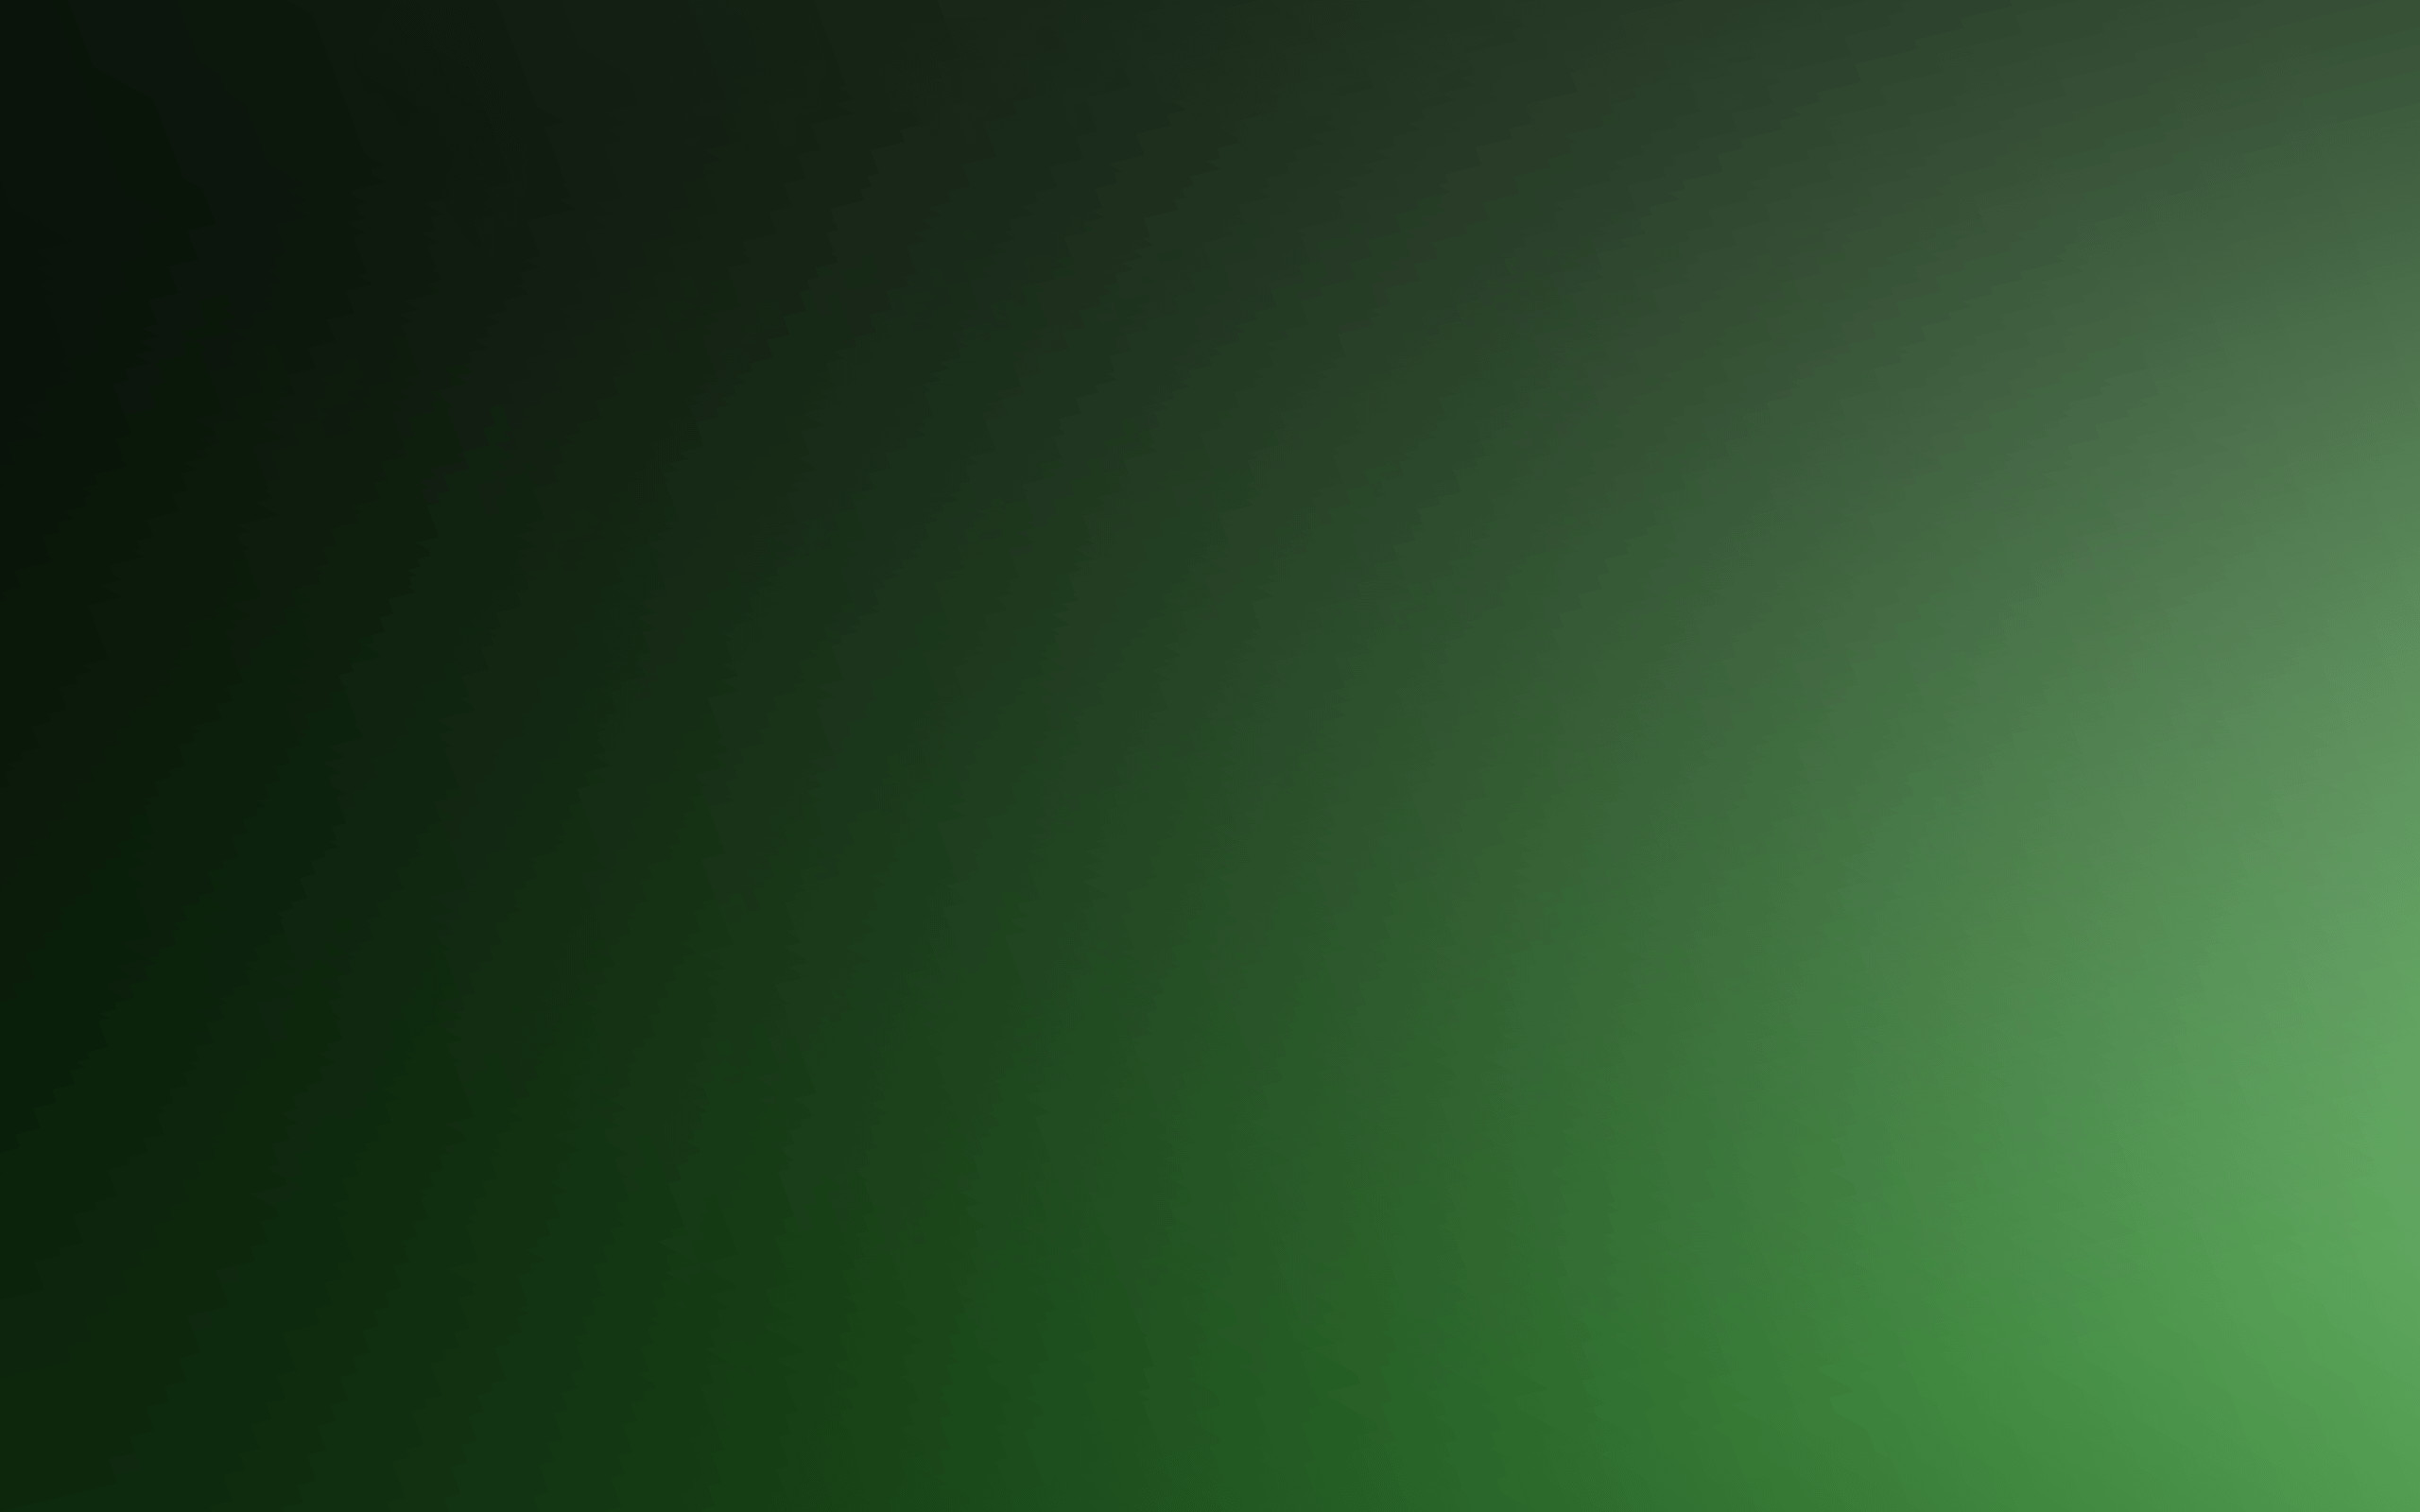 Dark Green Backgrounds – Wallpaper Cave